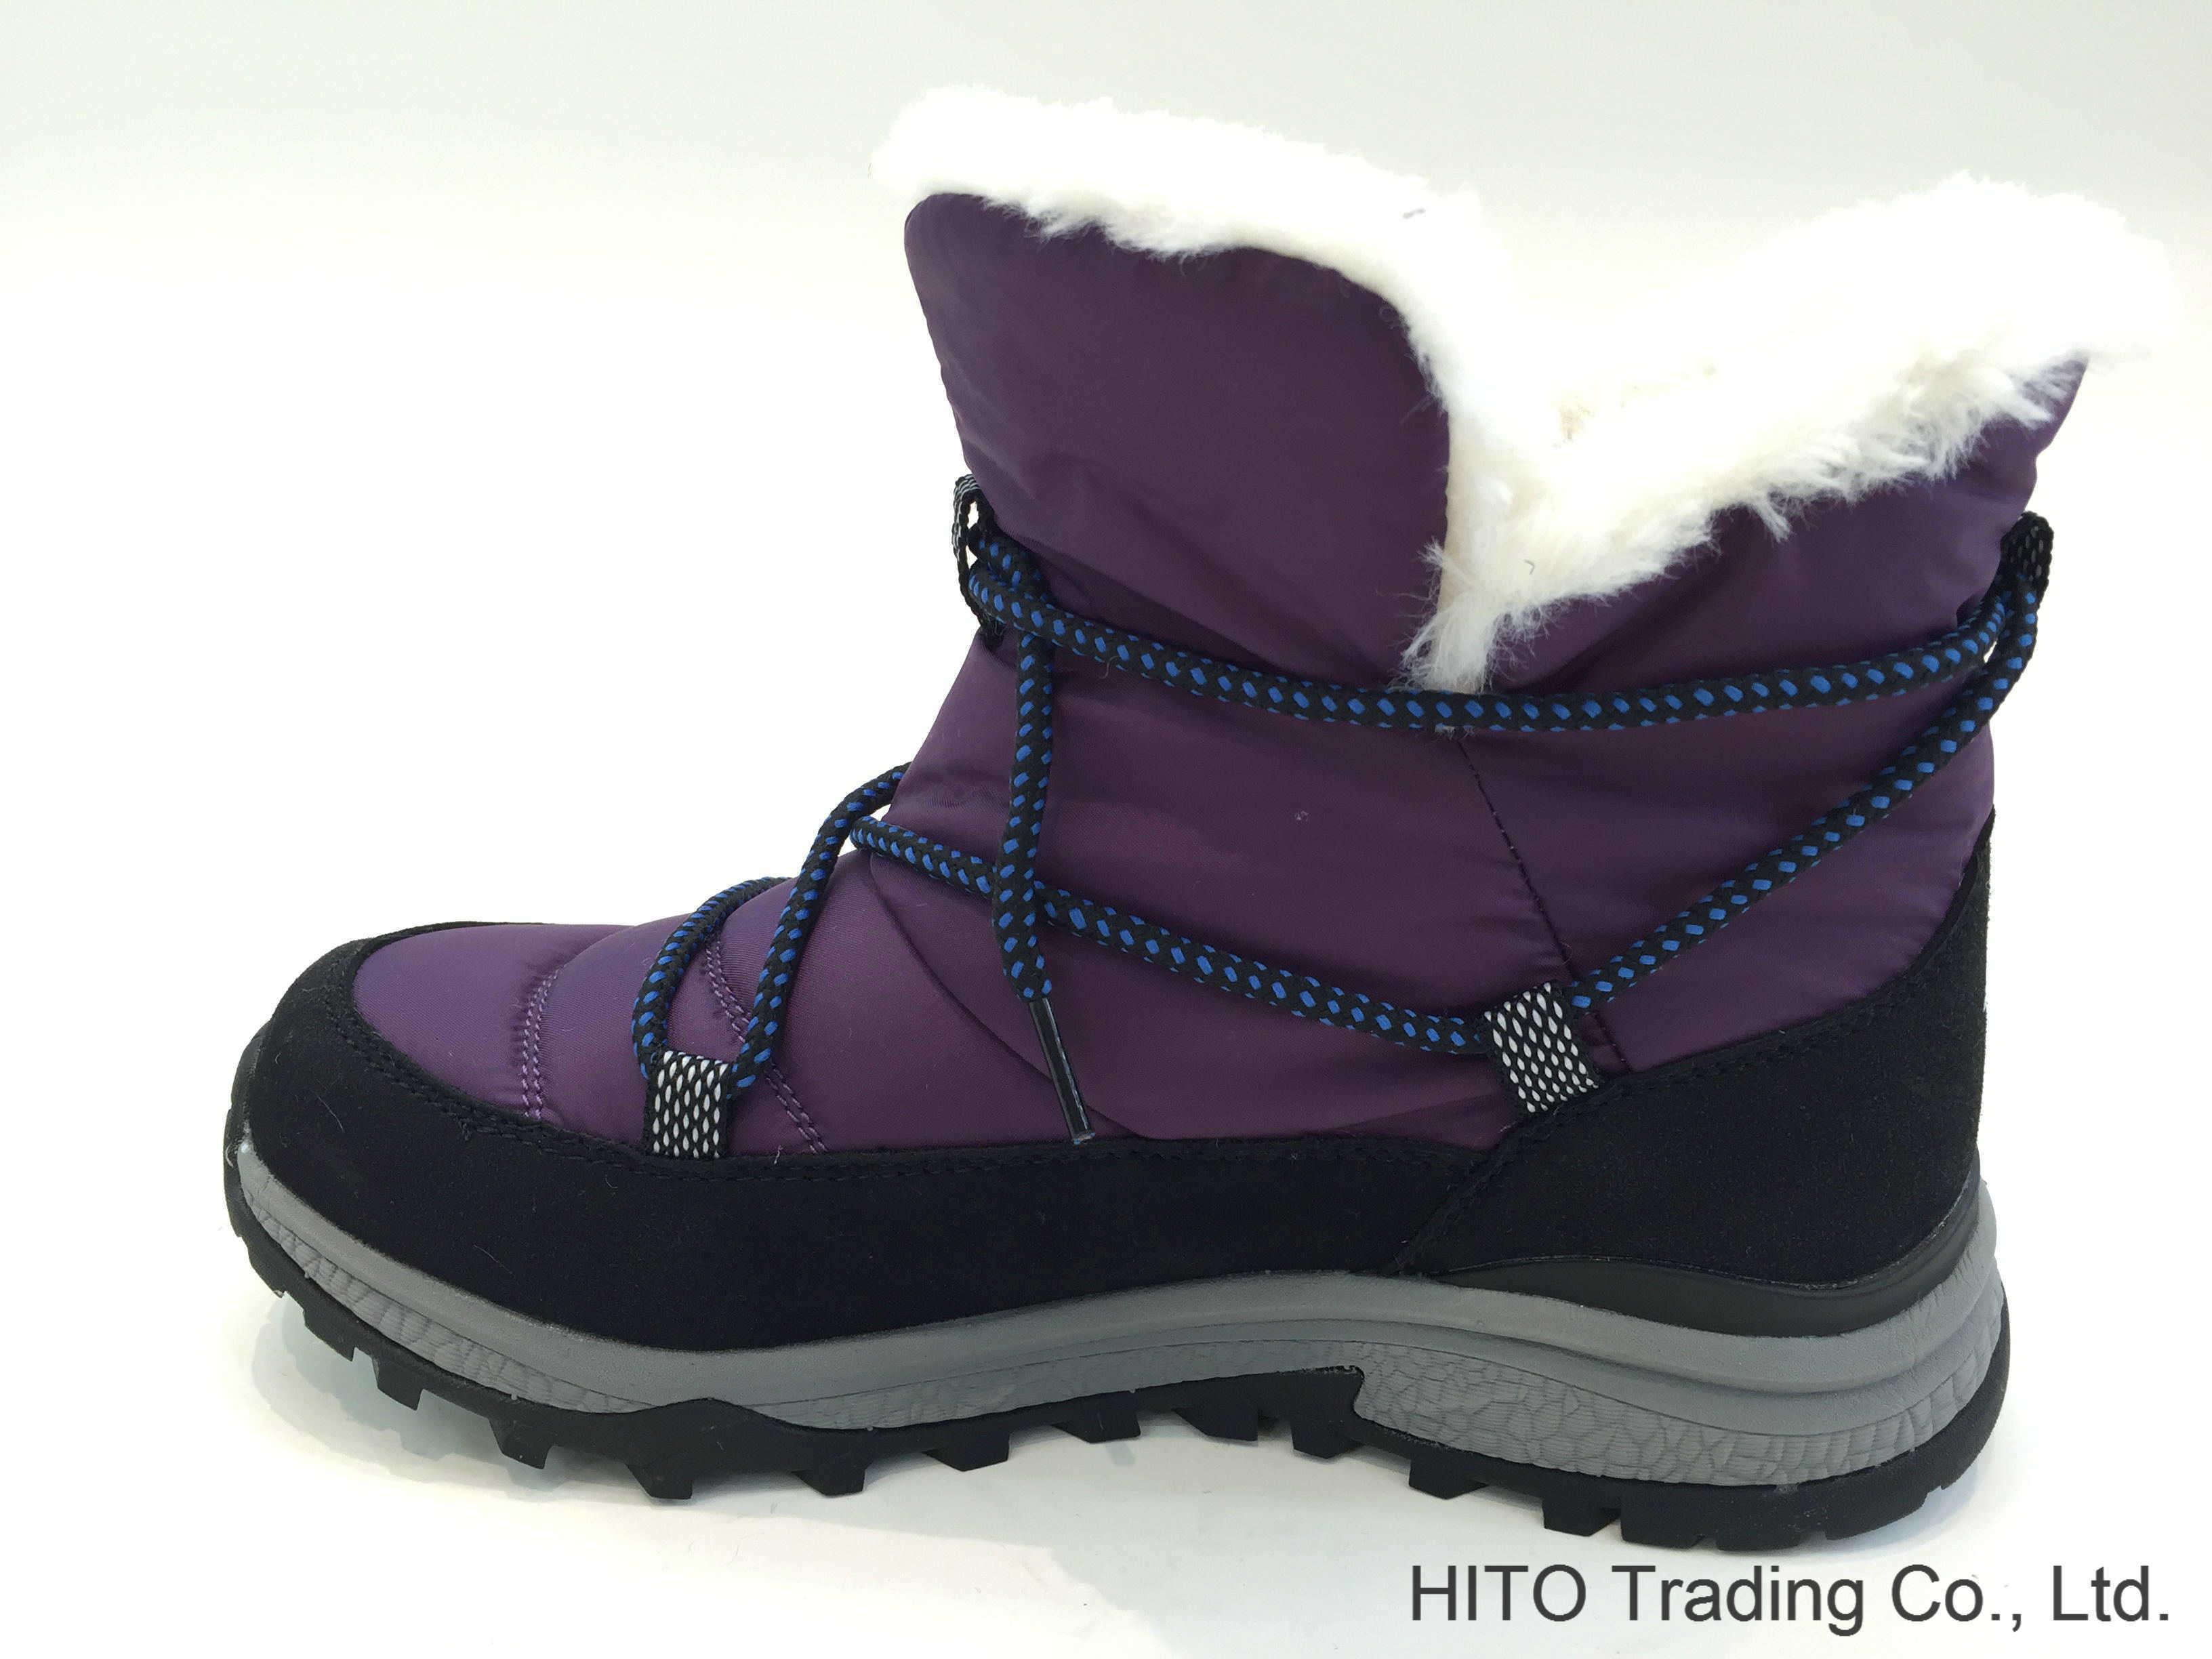 4e8c34870af [Hot Item] Best Selling Purple Slip-Resistant Puncture-Resistant Work  Footwear